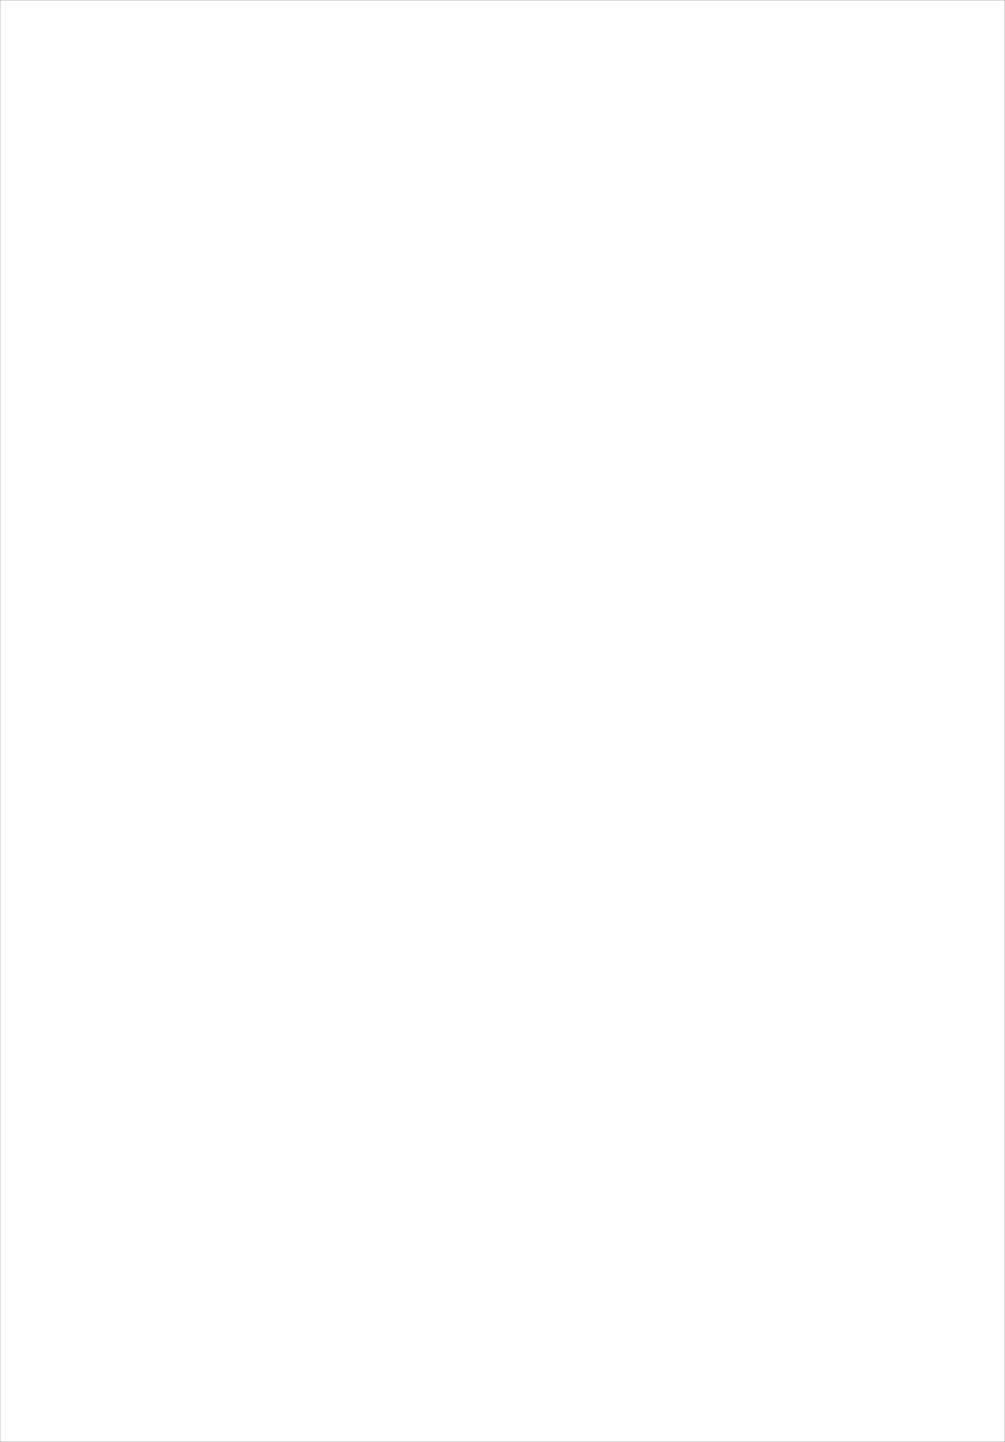 Hijiri Deisuikan 1